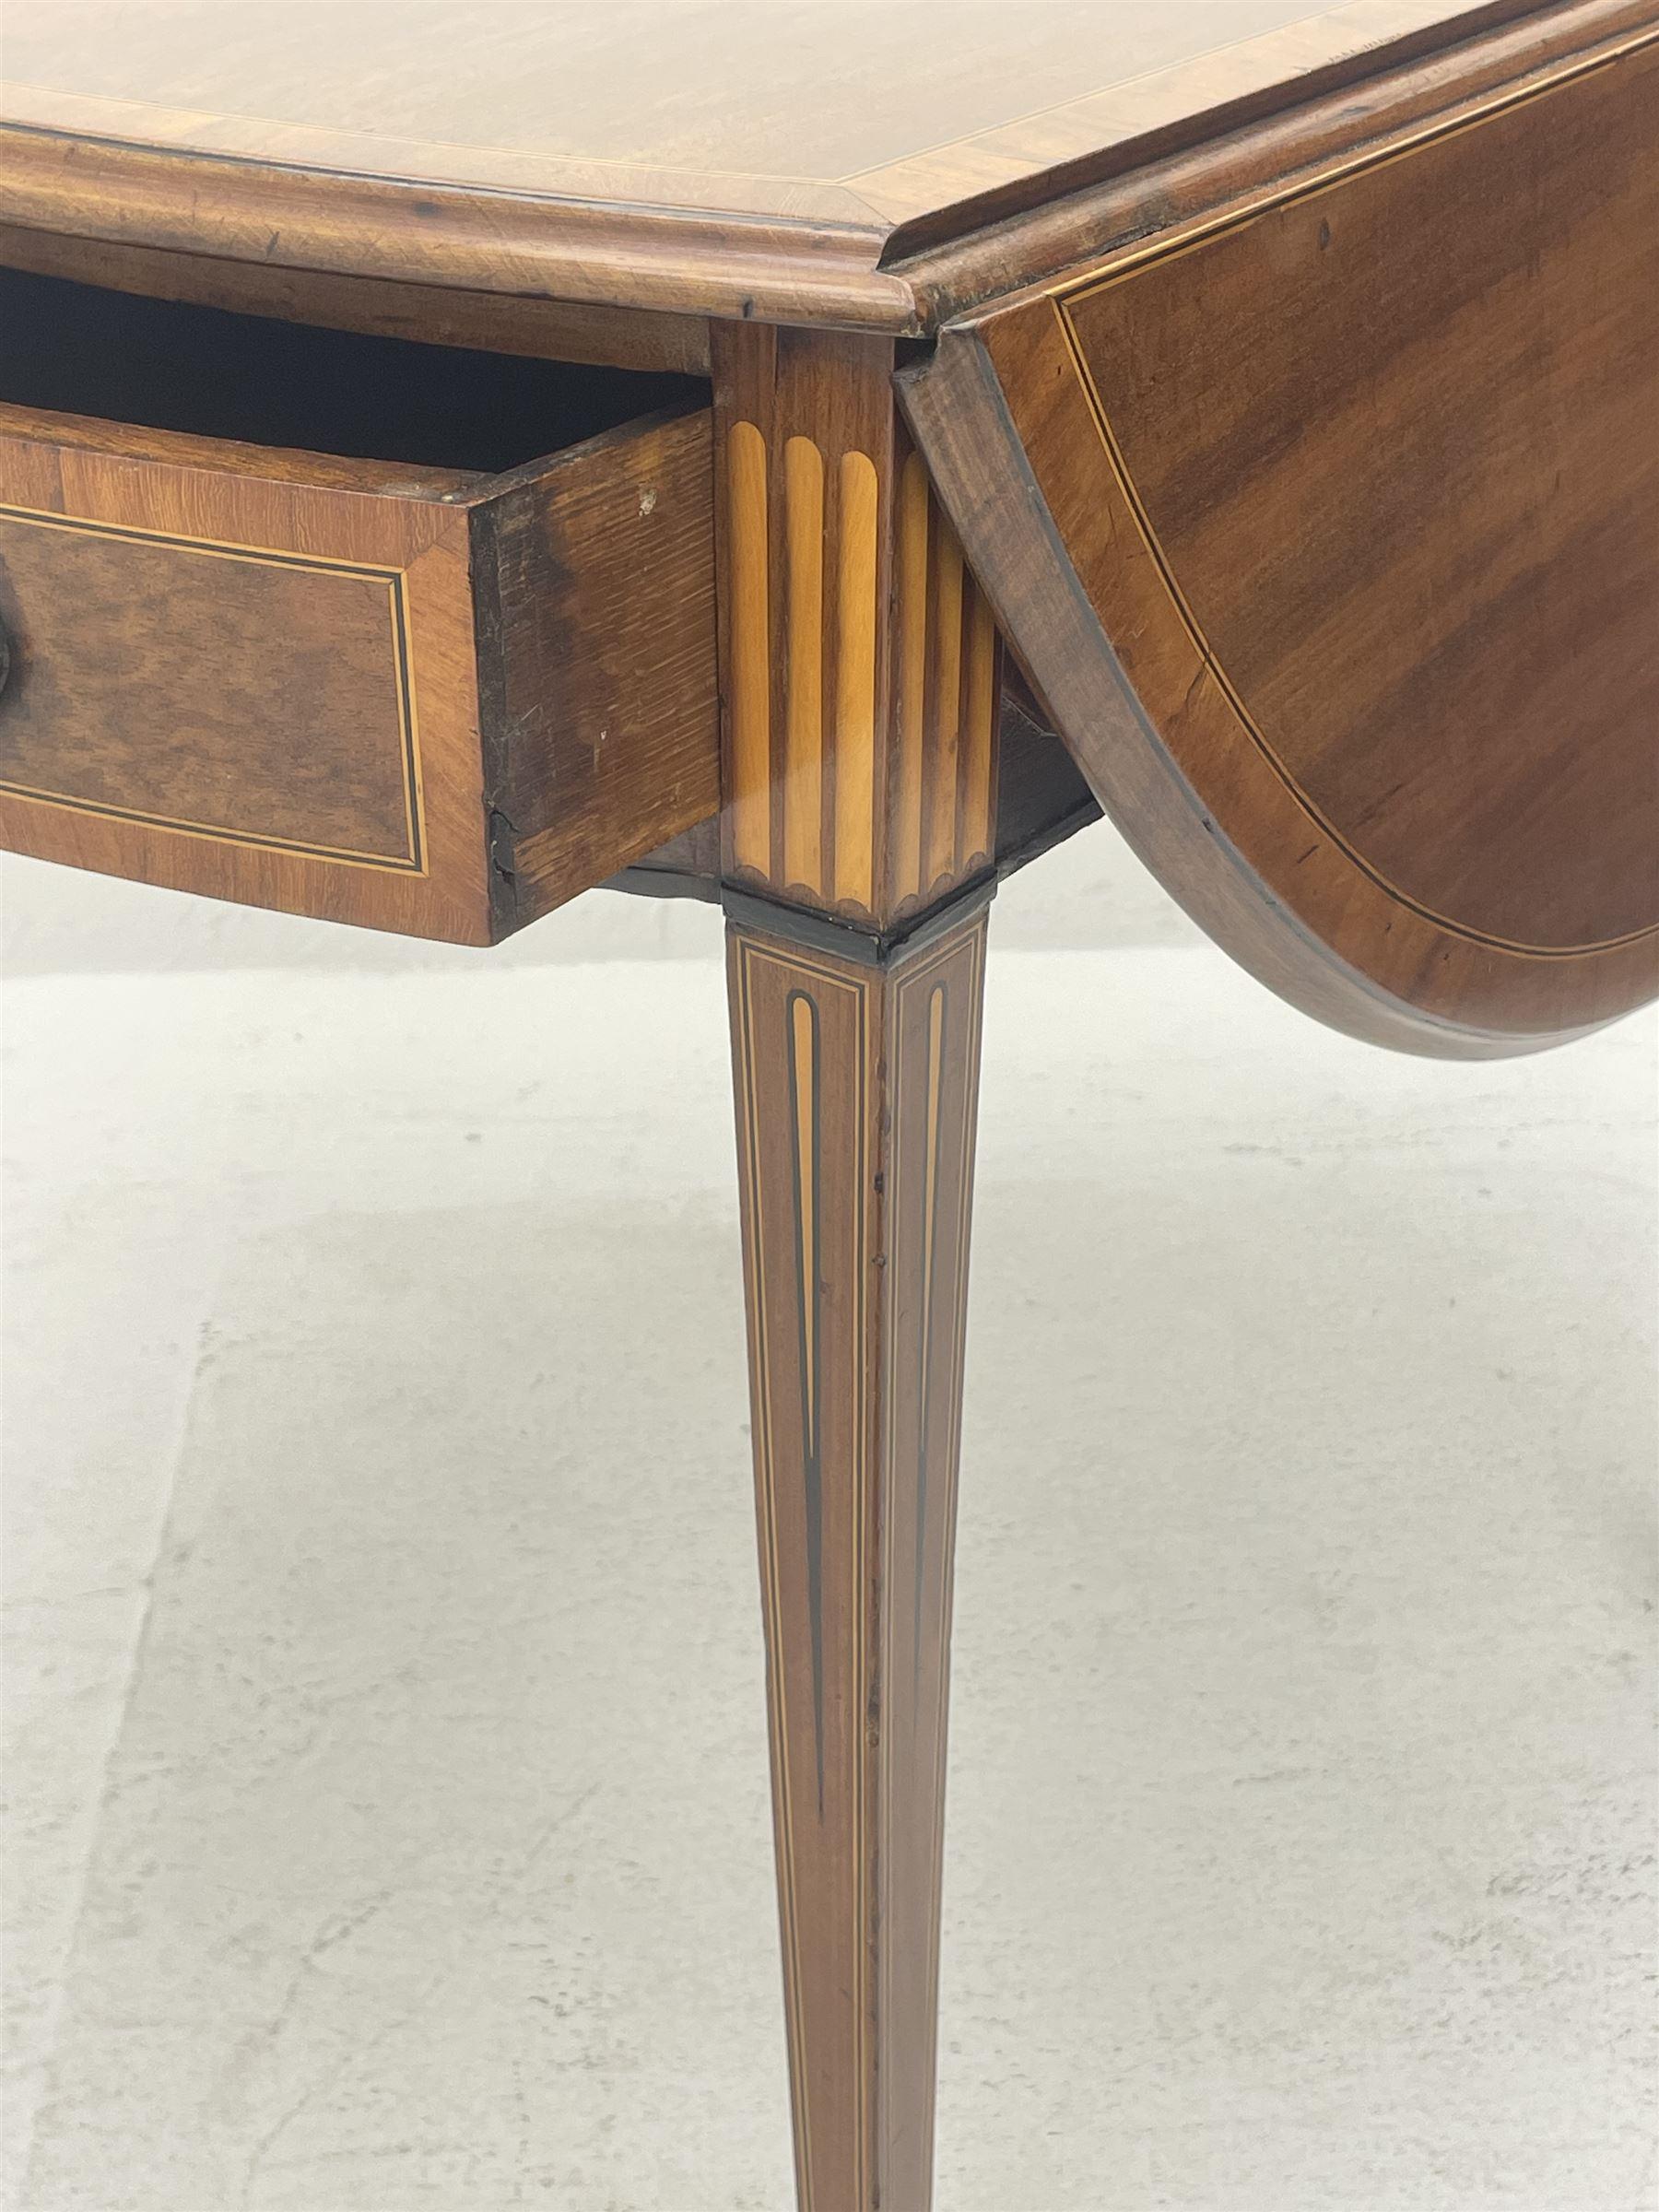 Sheraton period mahogany Pembroke table - Image 8 of 8